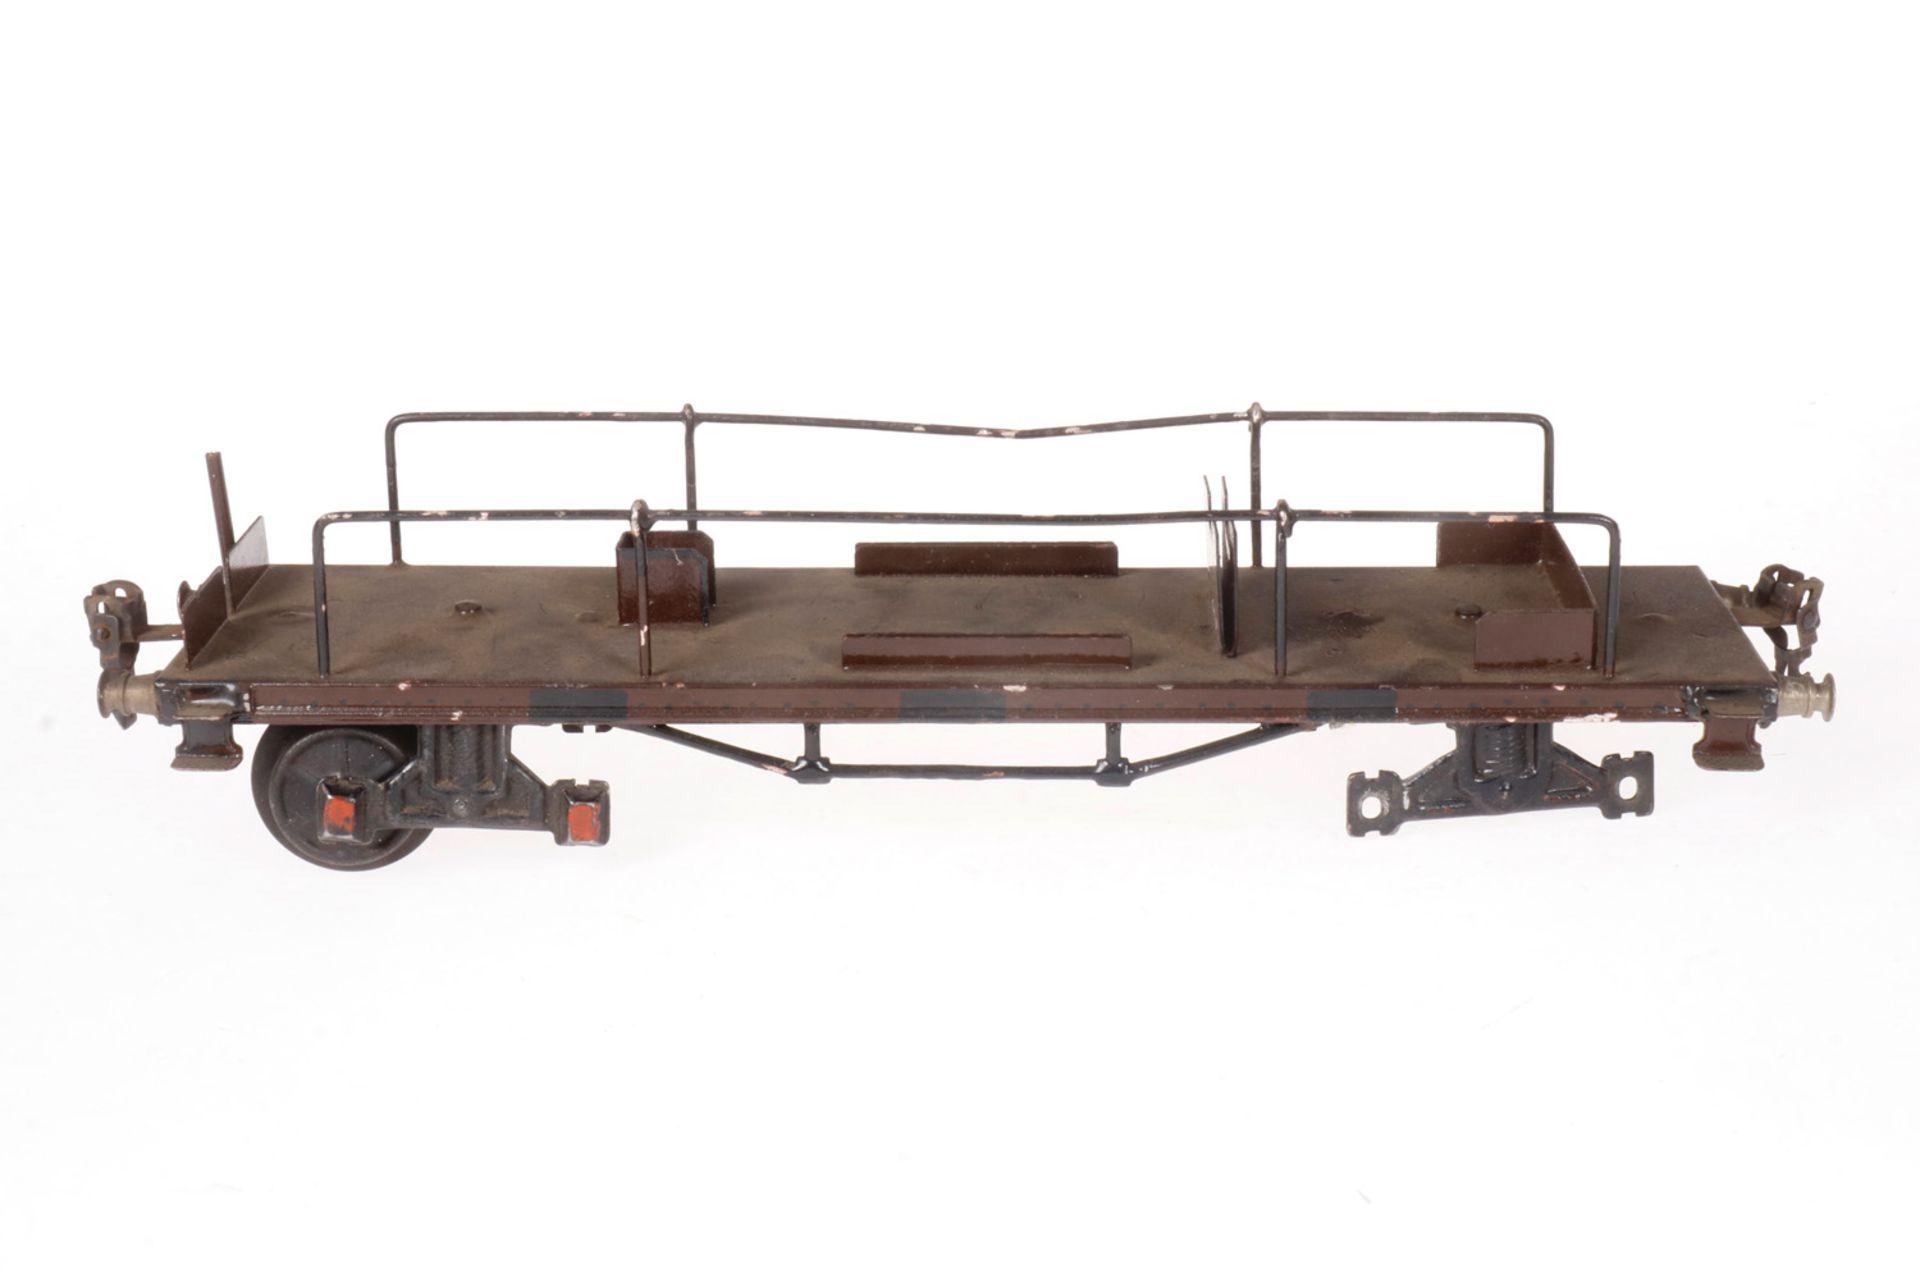 Märklin Flugzeugtransportwagen 1881, S 1, HL, Drehgestelle ersetzt, NV, L 31,5, Z 3